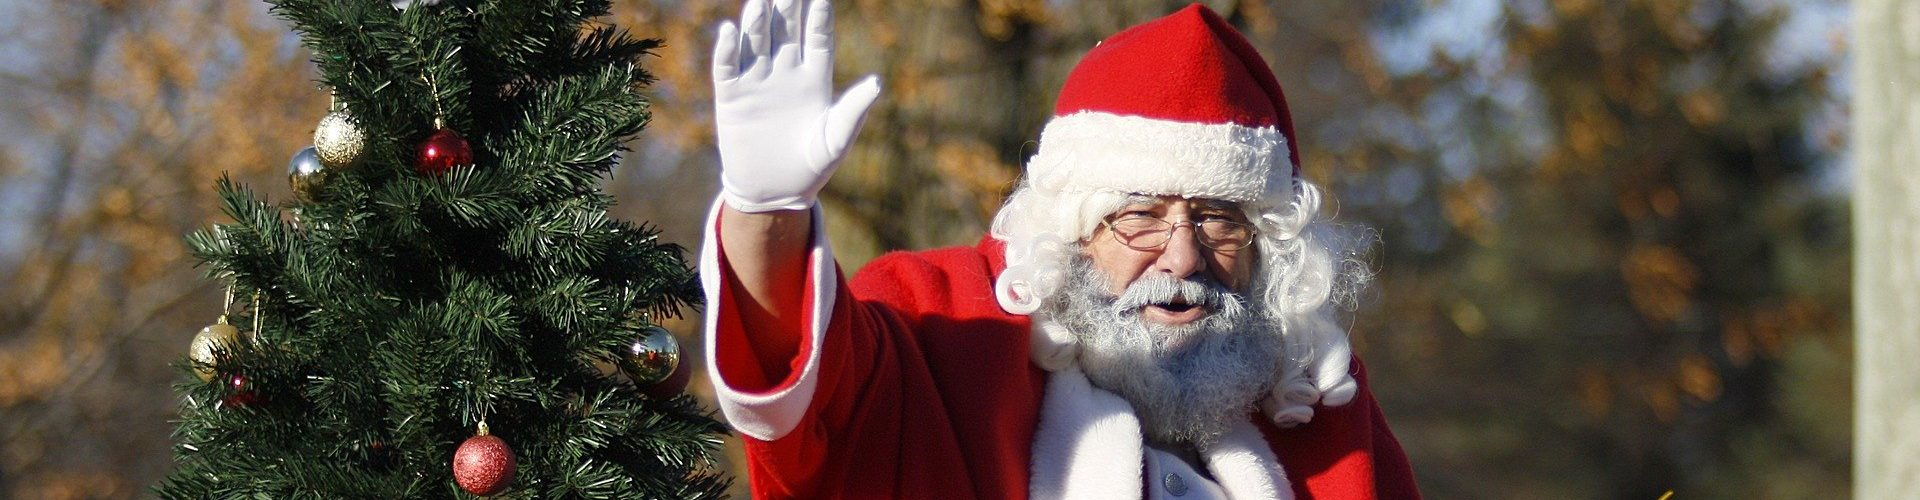 Denton Md Christmas Parade 2021 Christmas Parades On Delmarva 2019 Shorebread